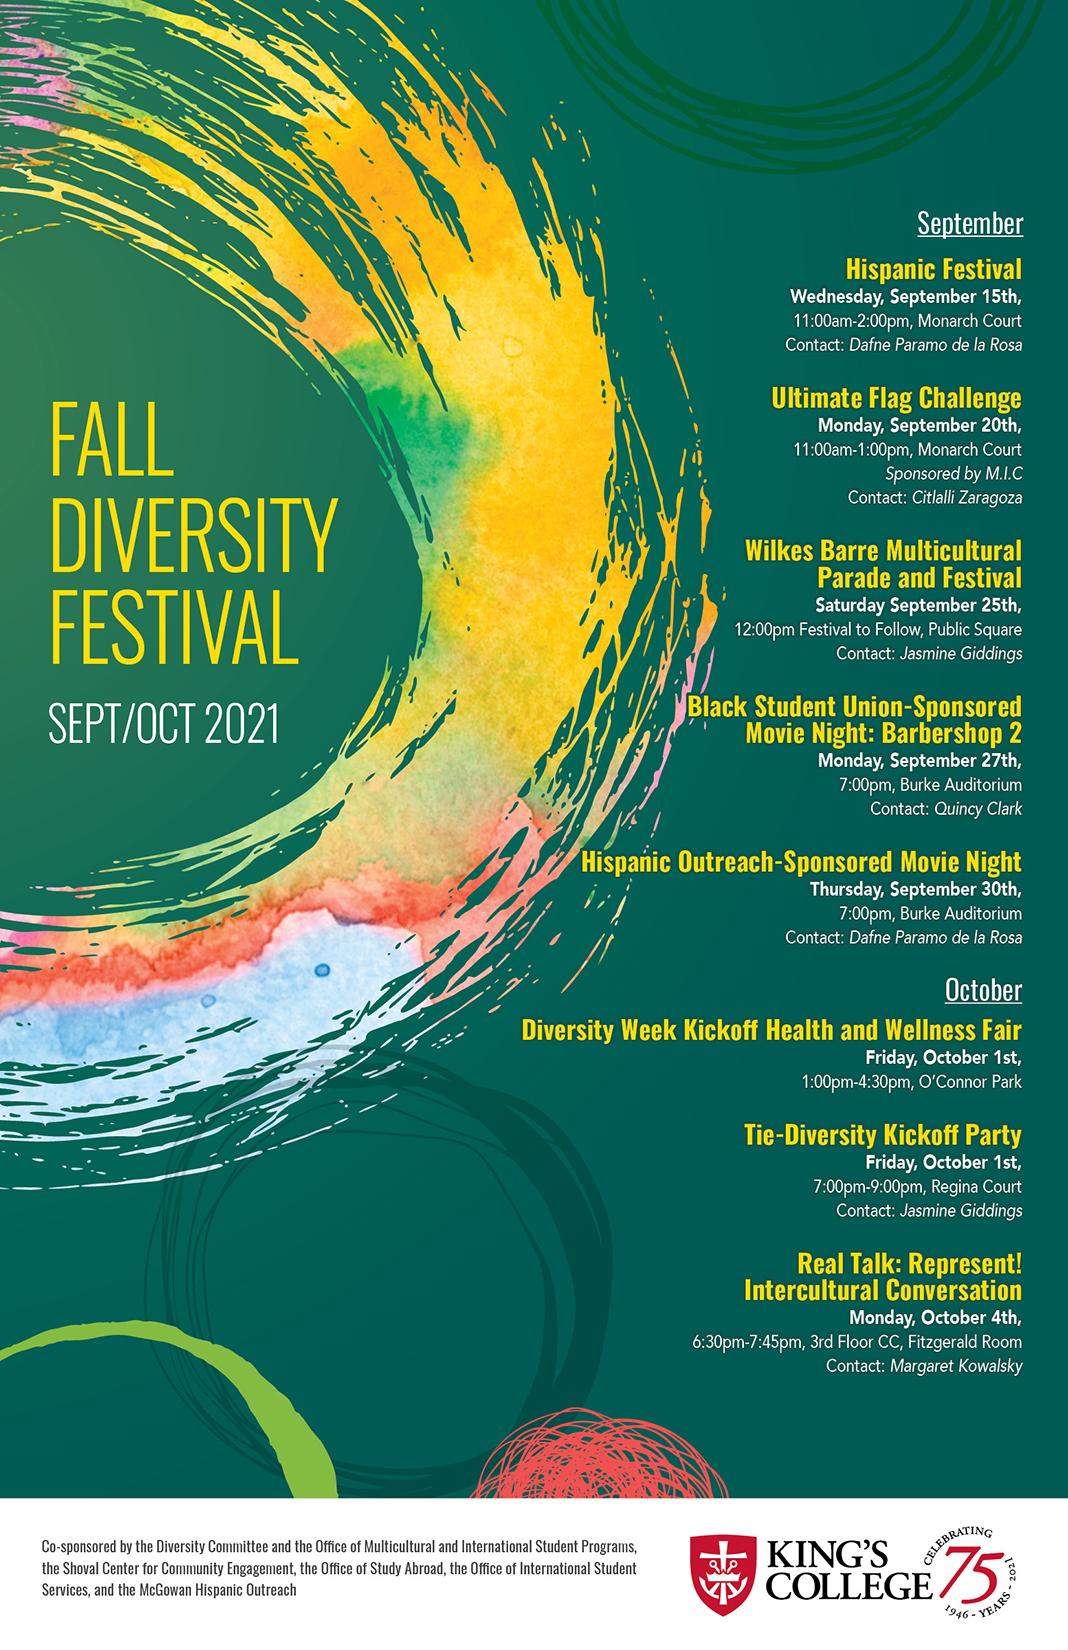 fall diversity festival flyer